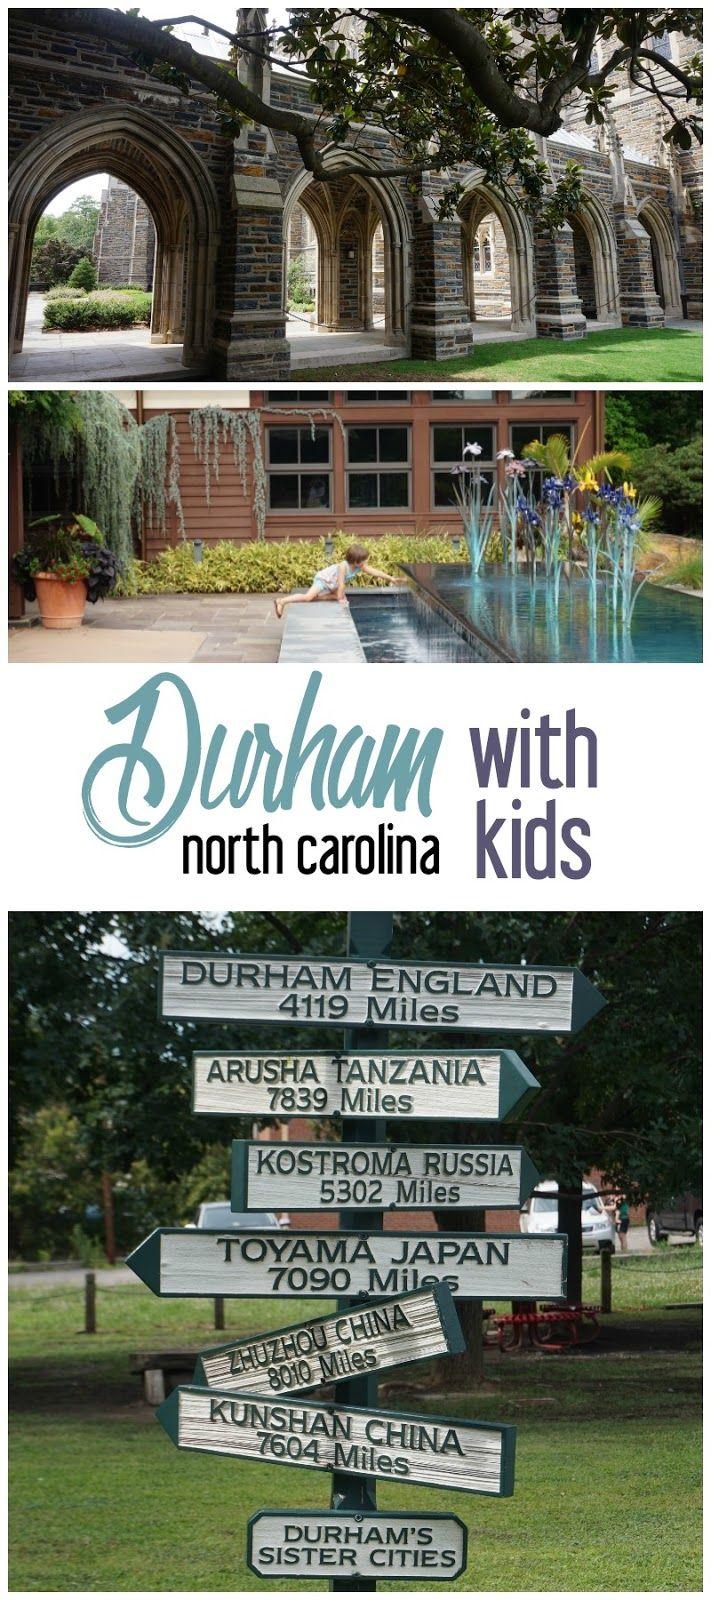 6 Kid-Friendly Spots in Durham, North Carolina | CosmosMariners.com